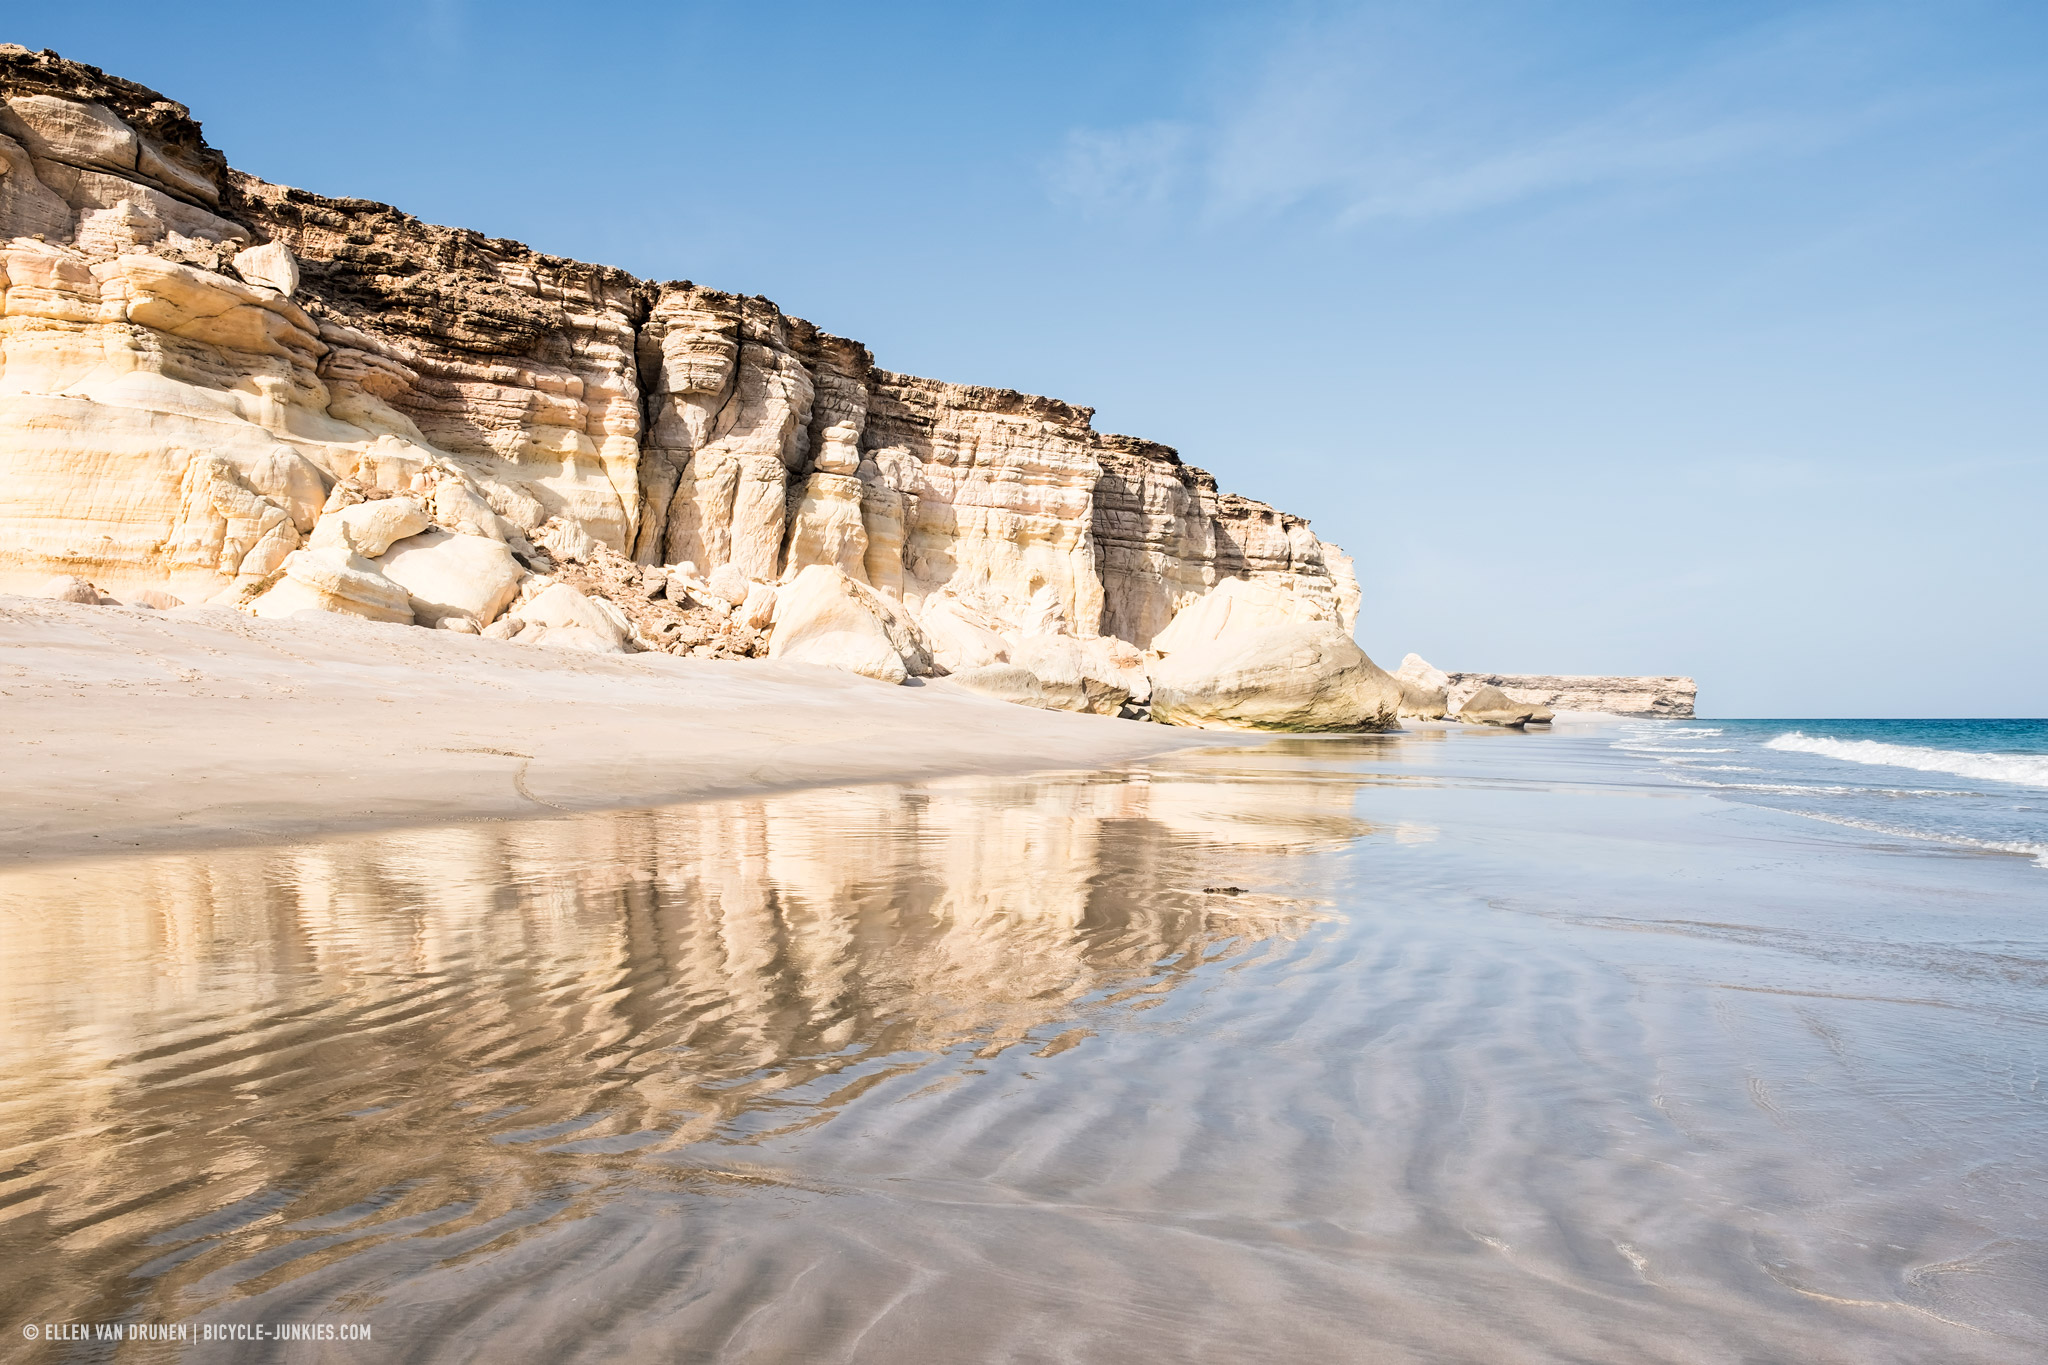 Beach at Ras al Jinz